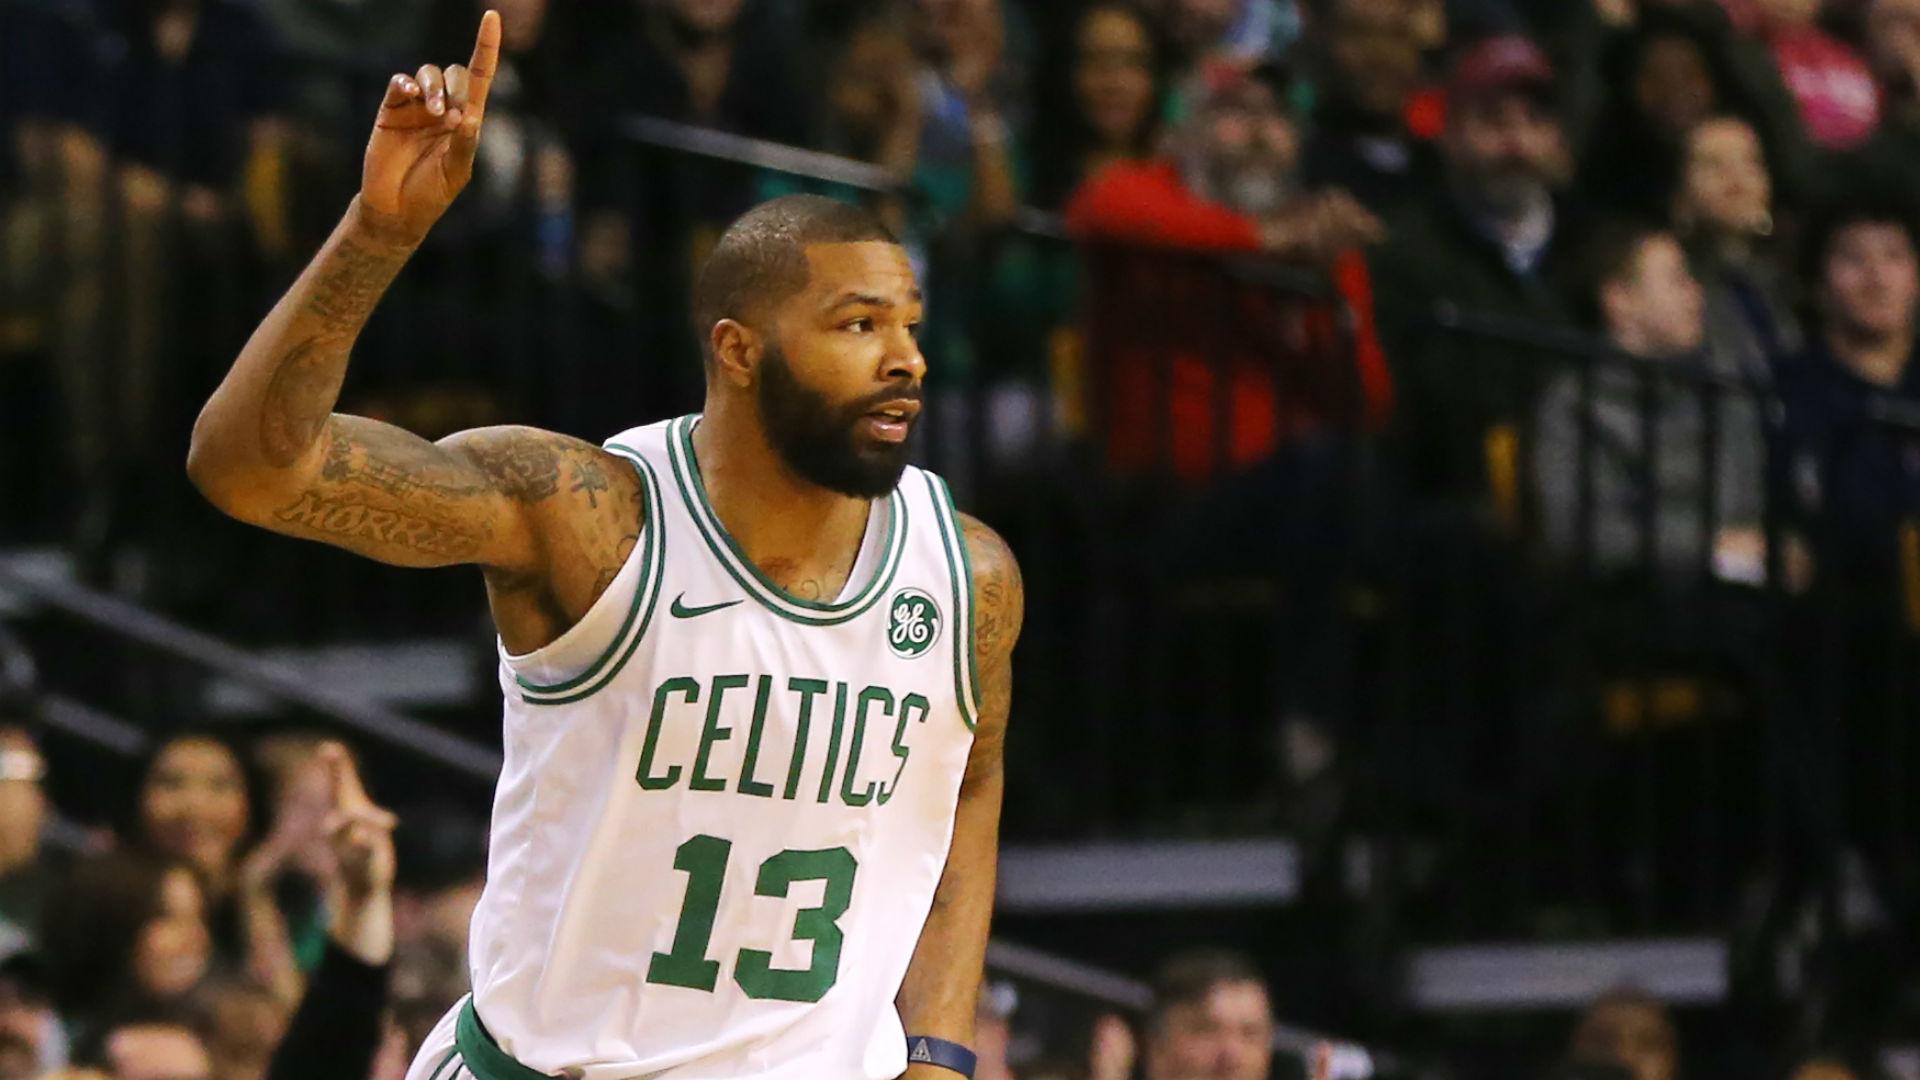 official photos 7a128 a28c2 NBA wrap: Marcus Morris, Celtics capitalize on Thunder ...